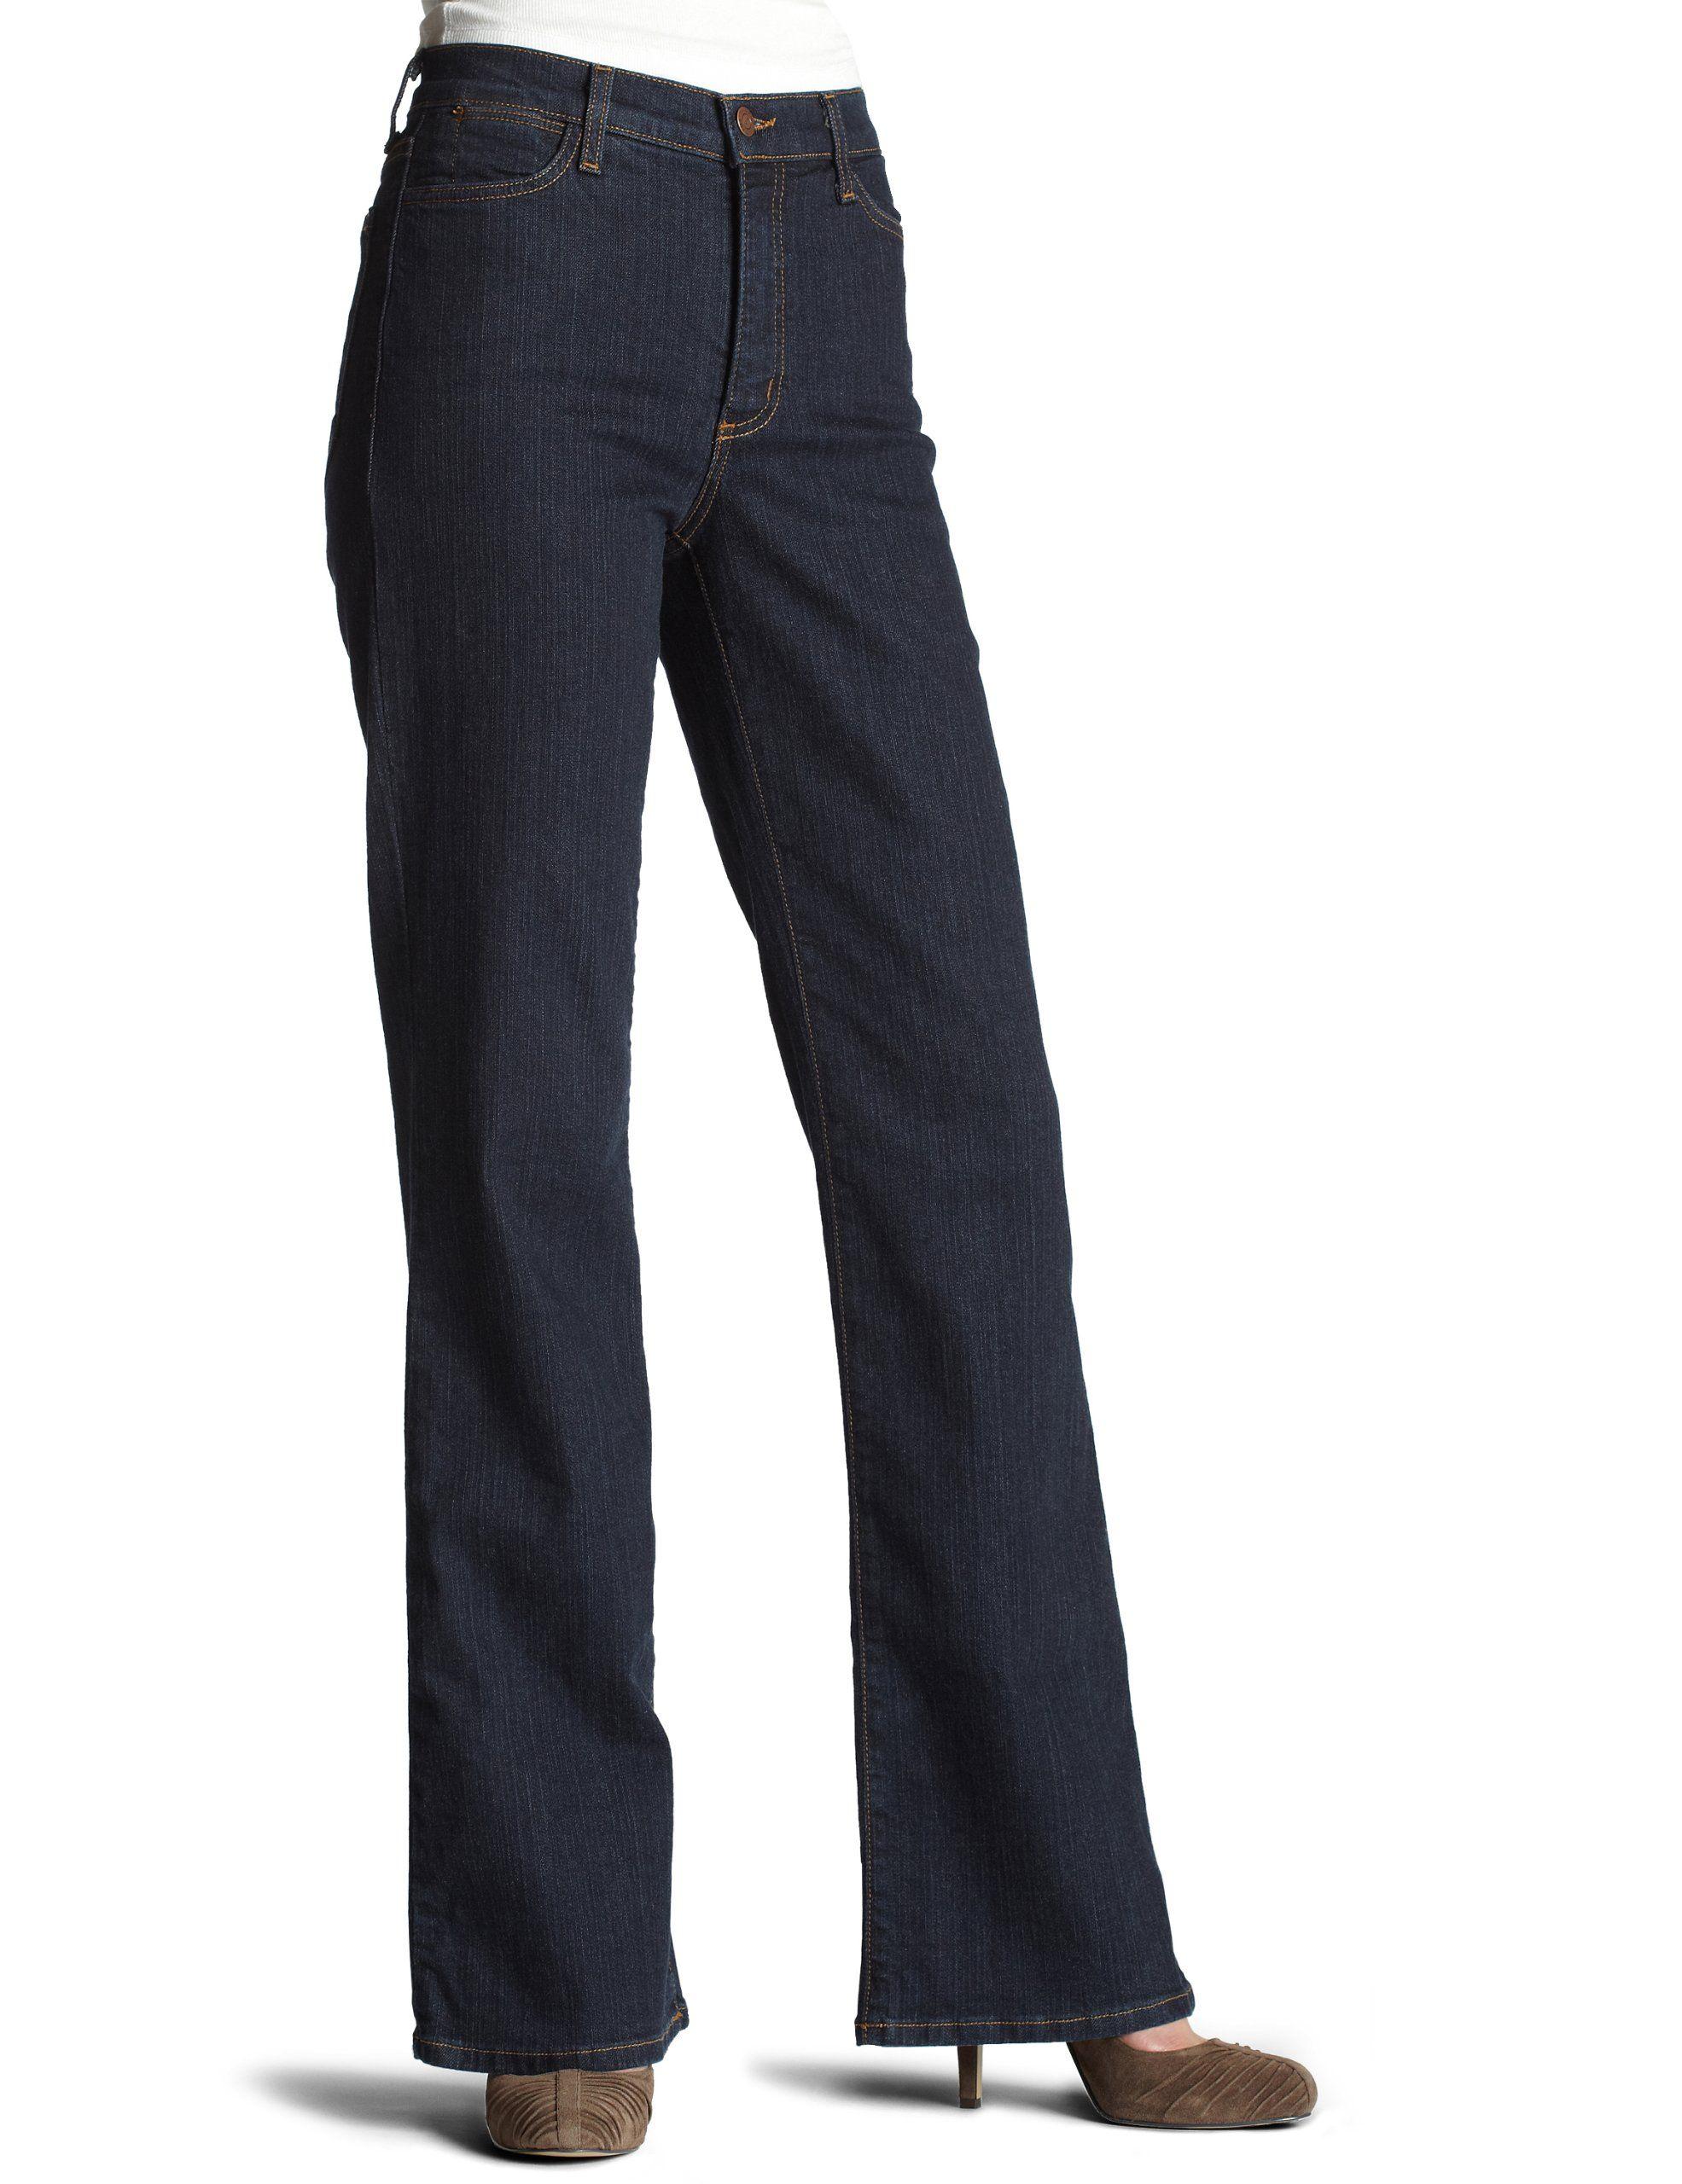 bb4a71f65bf  NotYourDaughter sJeans Tummy Tuck Women s 5 Pocket Bootcut Jean Best Price